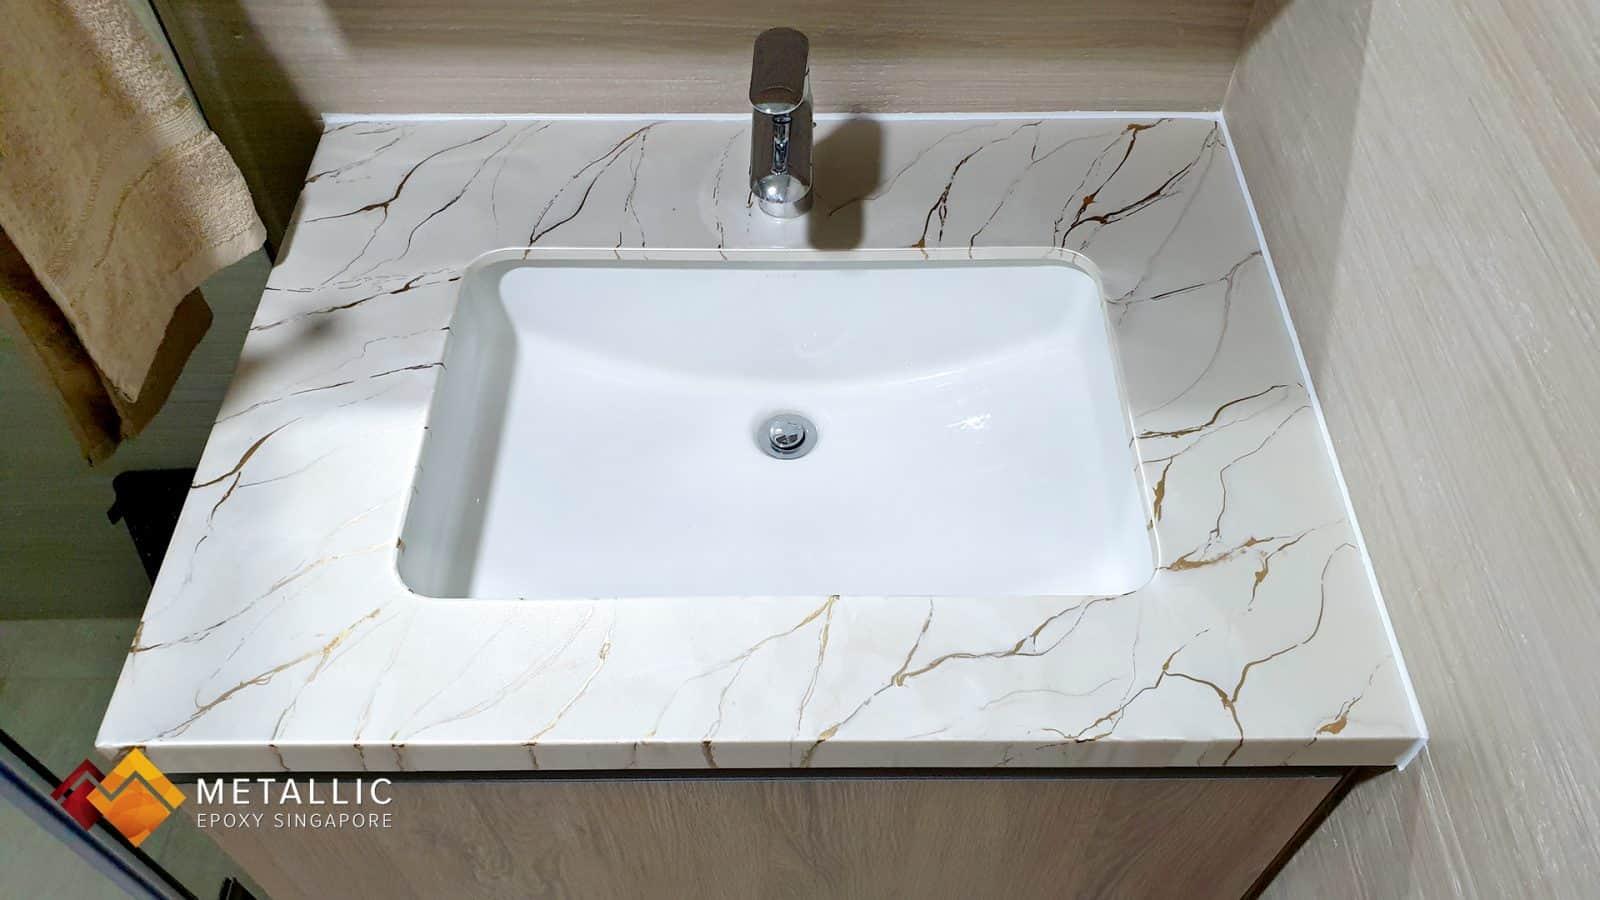 Metallic Epoxy Vanity Top Gold on Light Khaki Marble